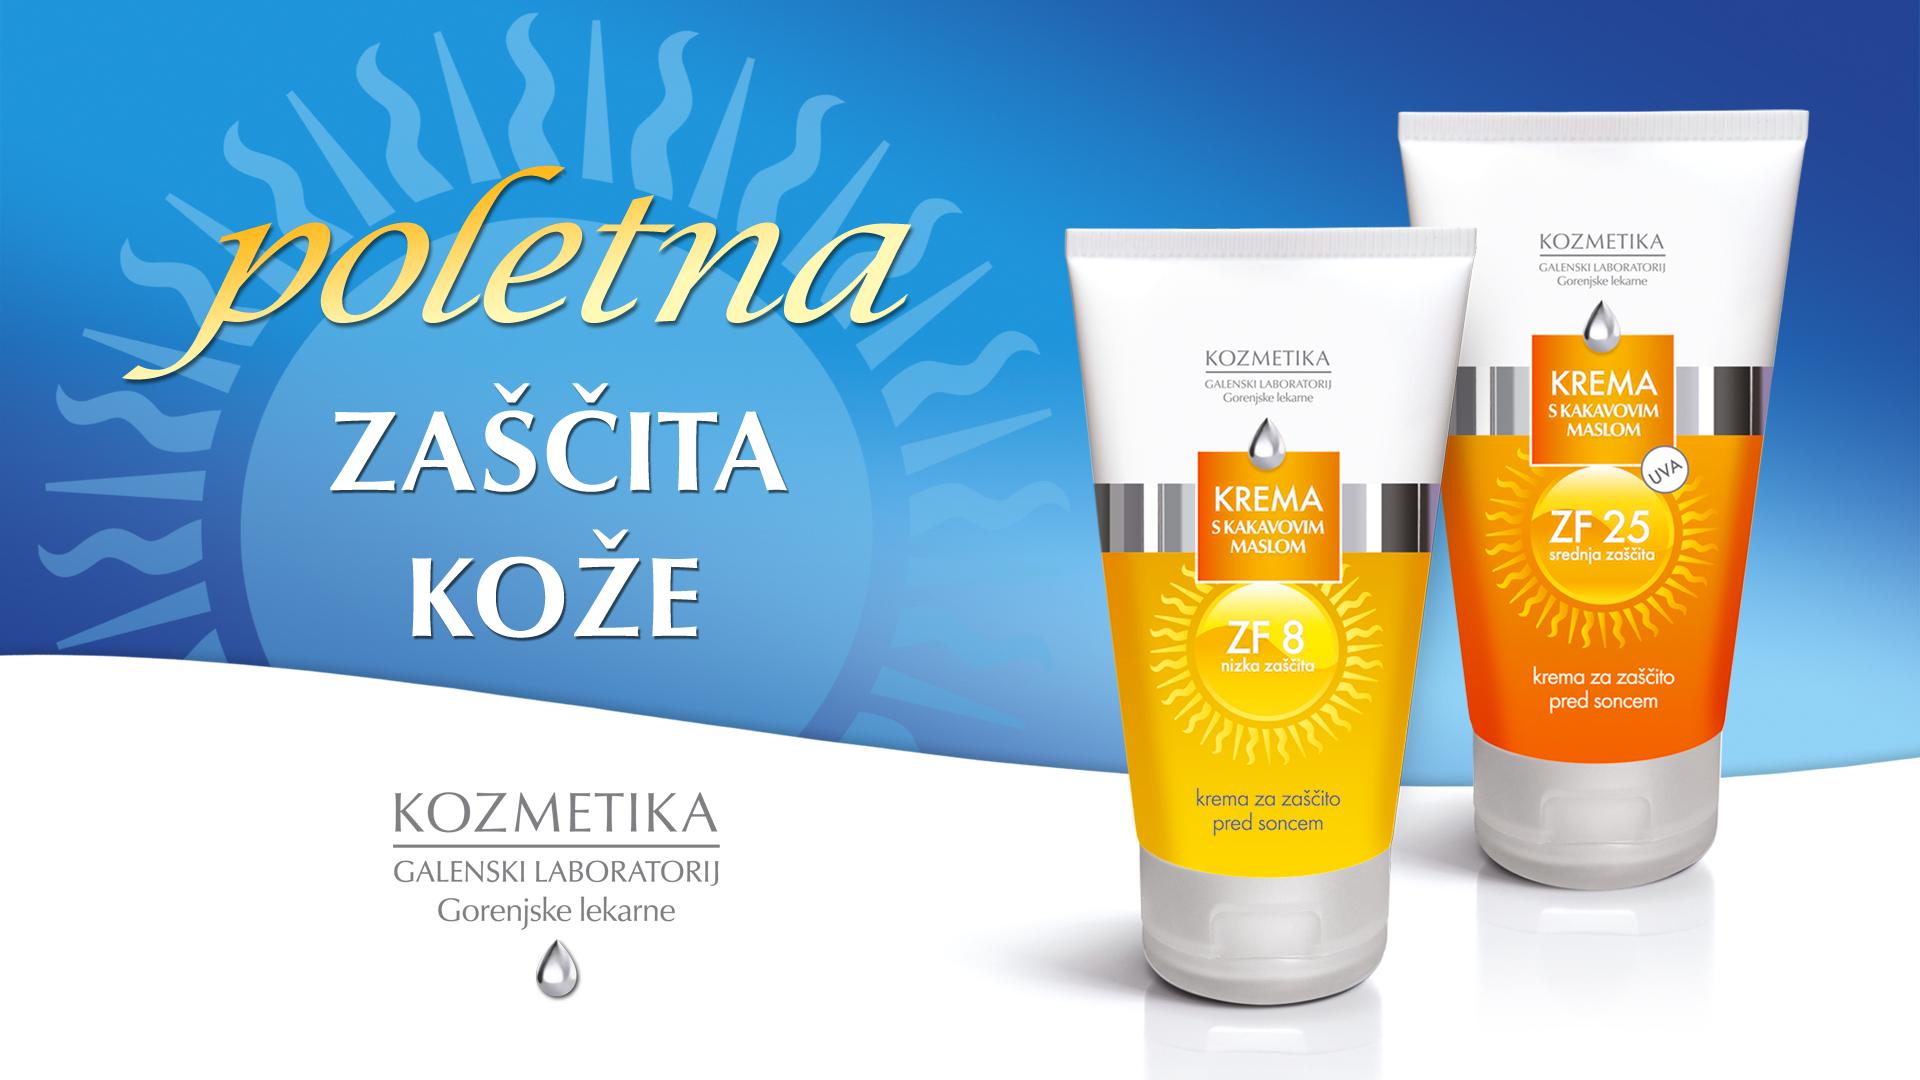 poletna zaščita kože